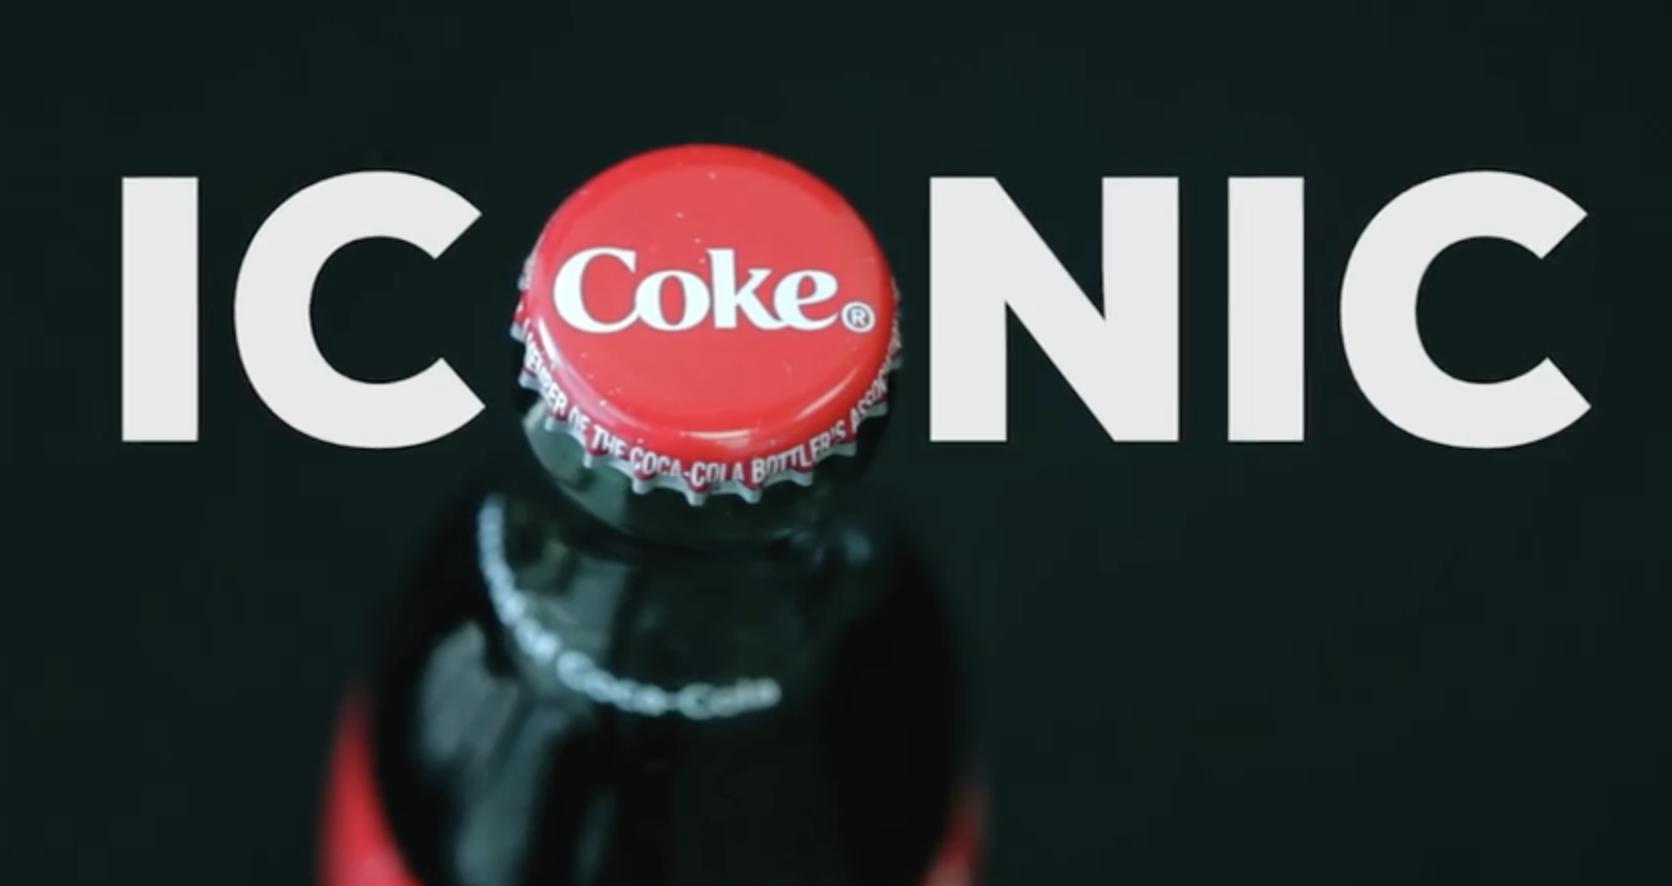 iconic bottle coca cola femsa